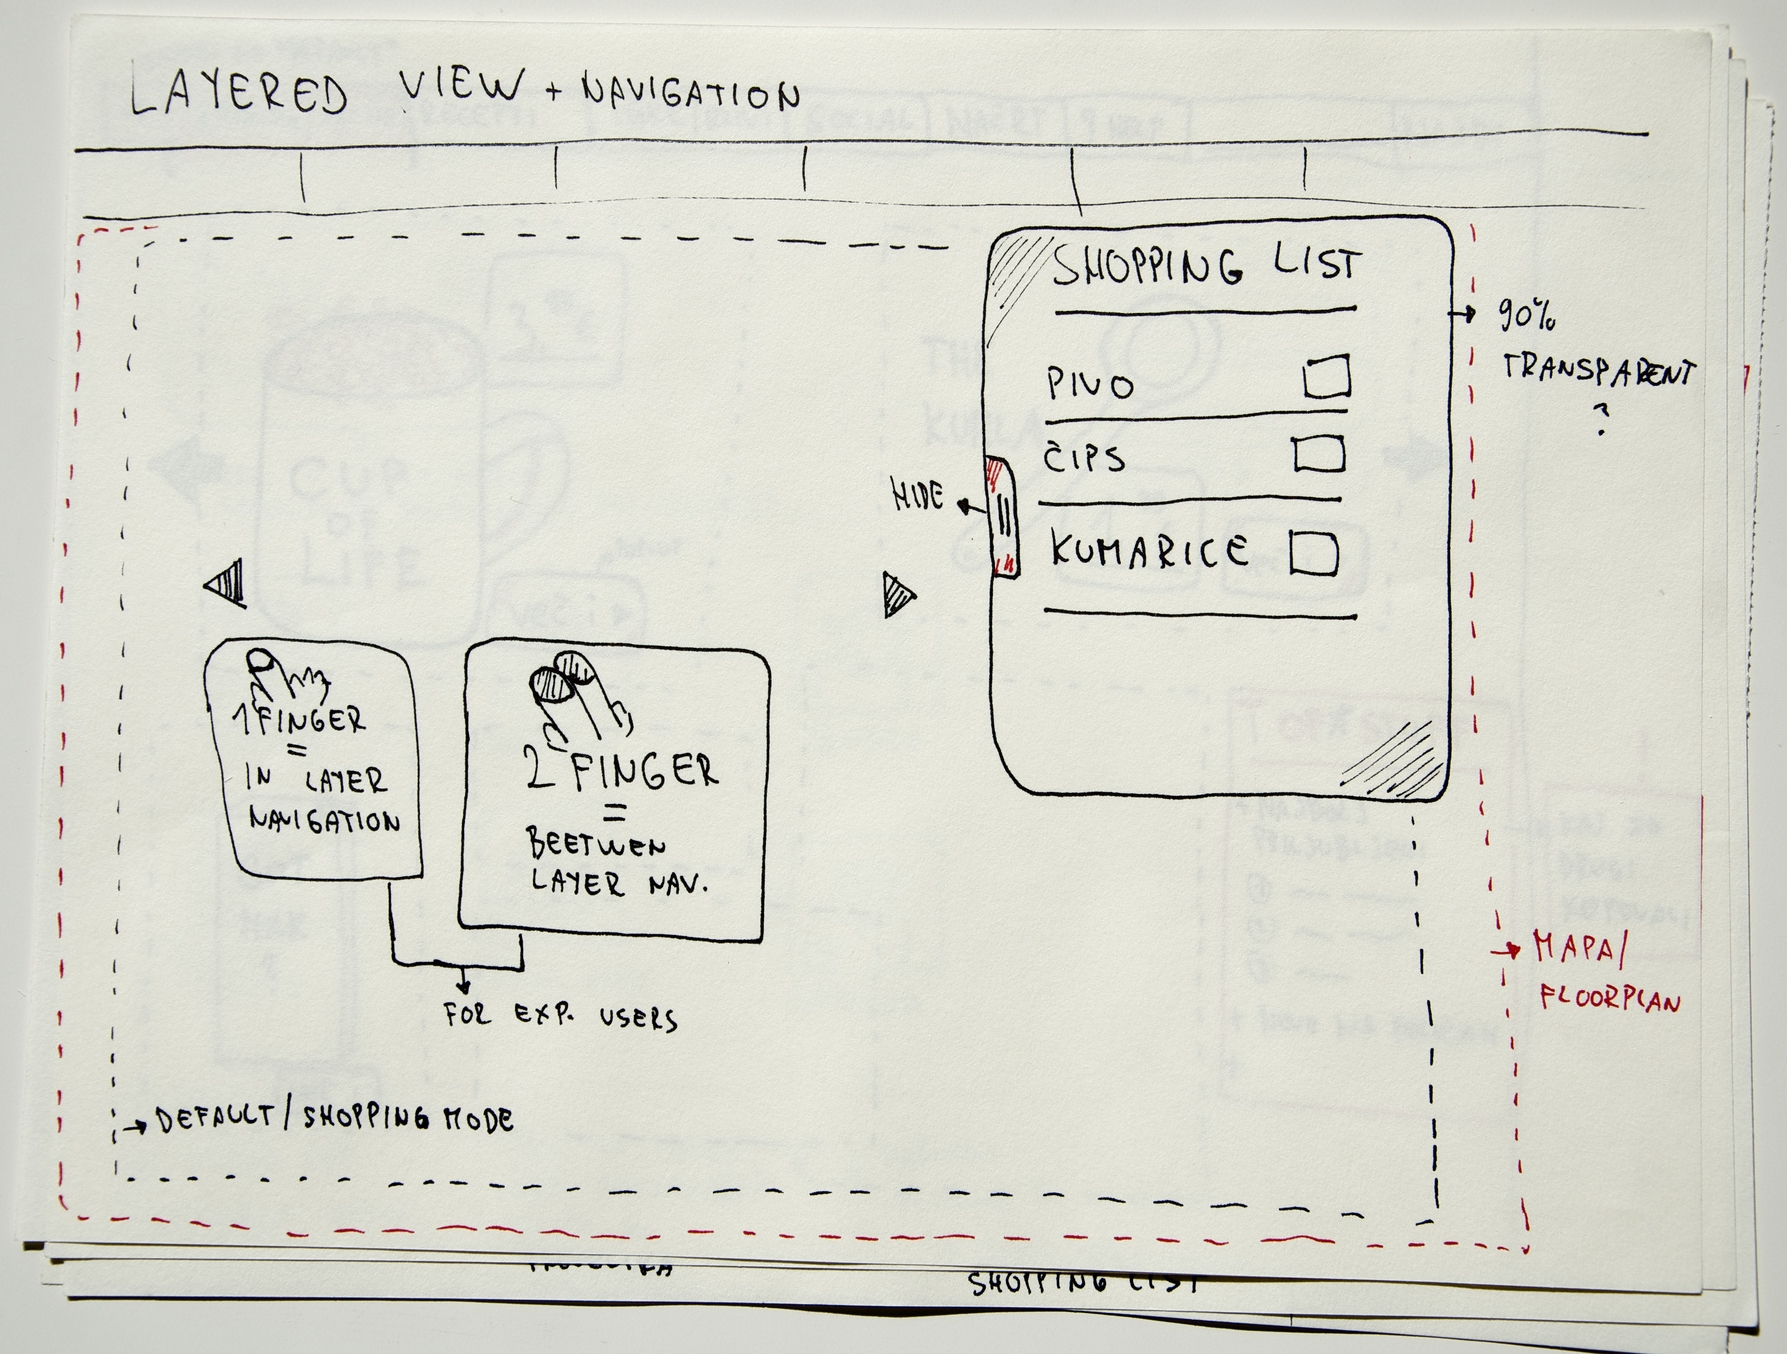 Layered View & Navigation